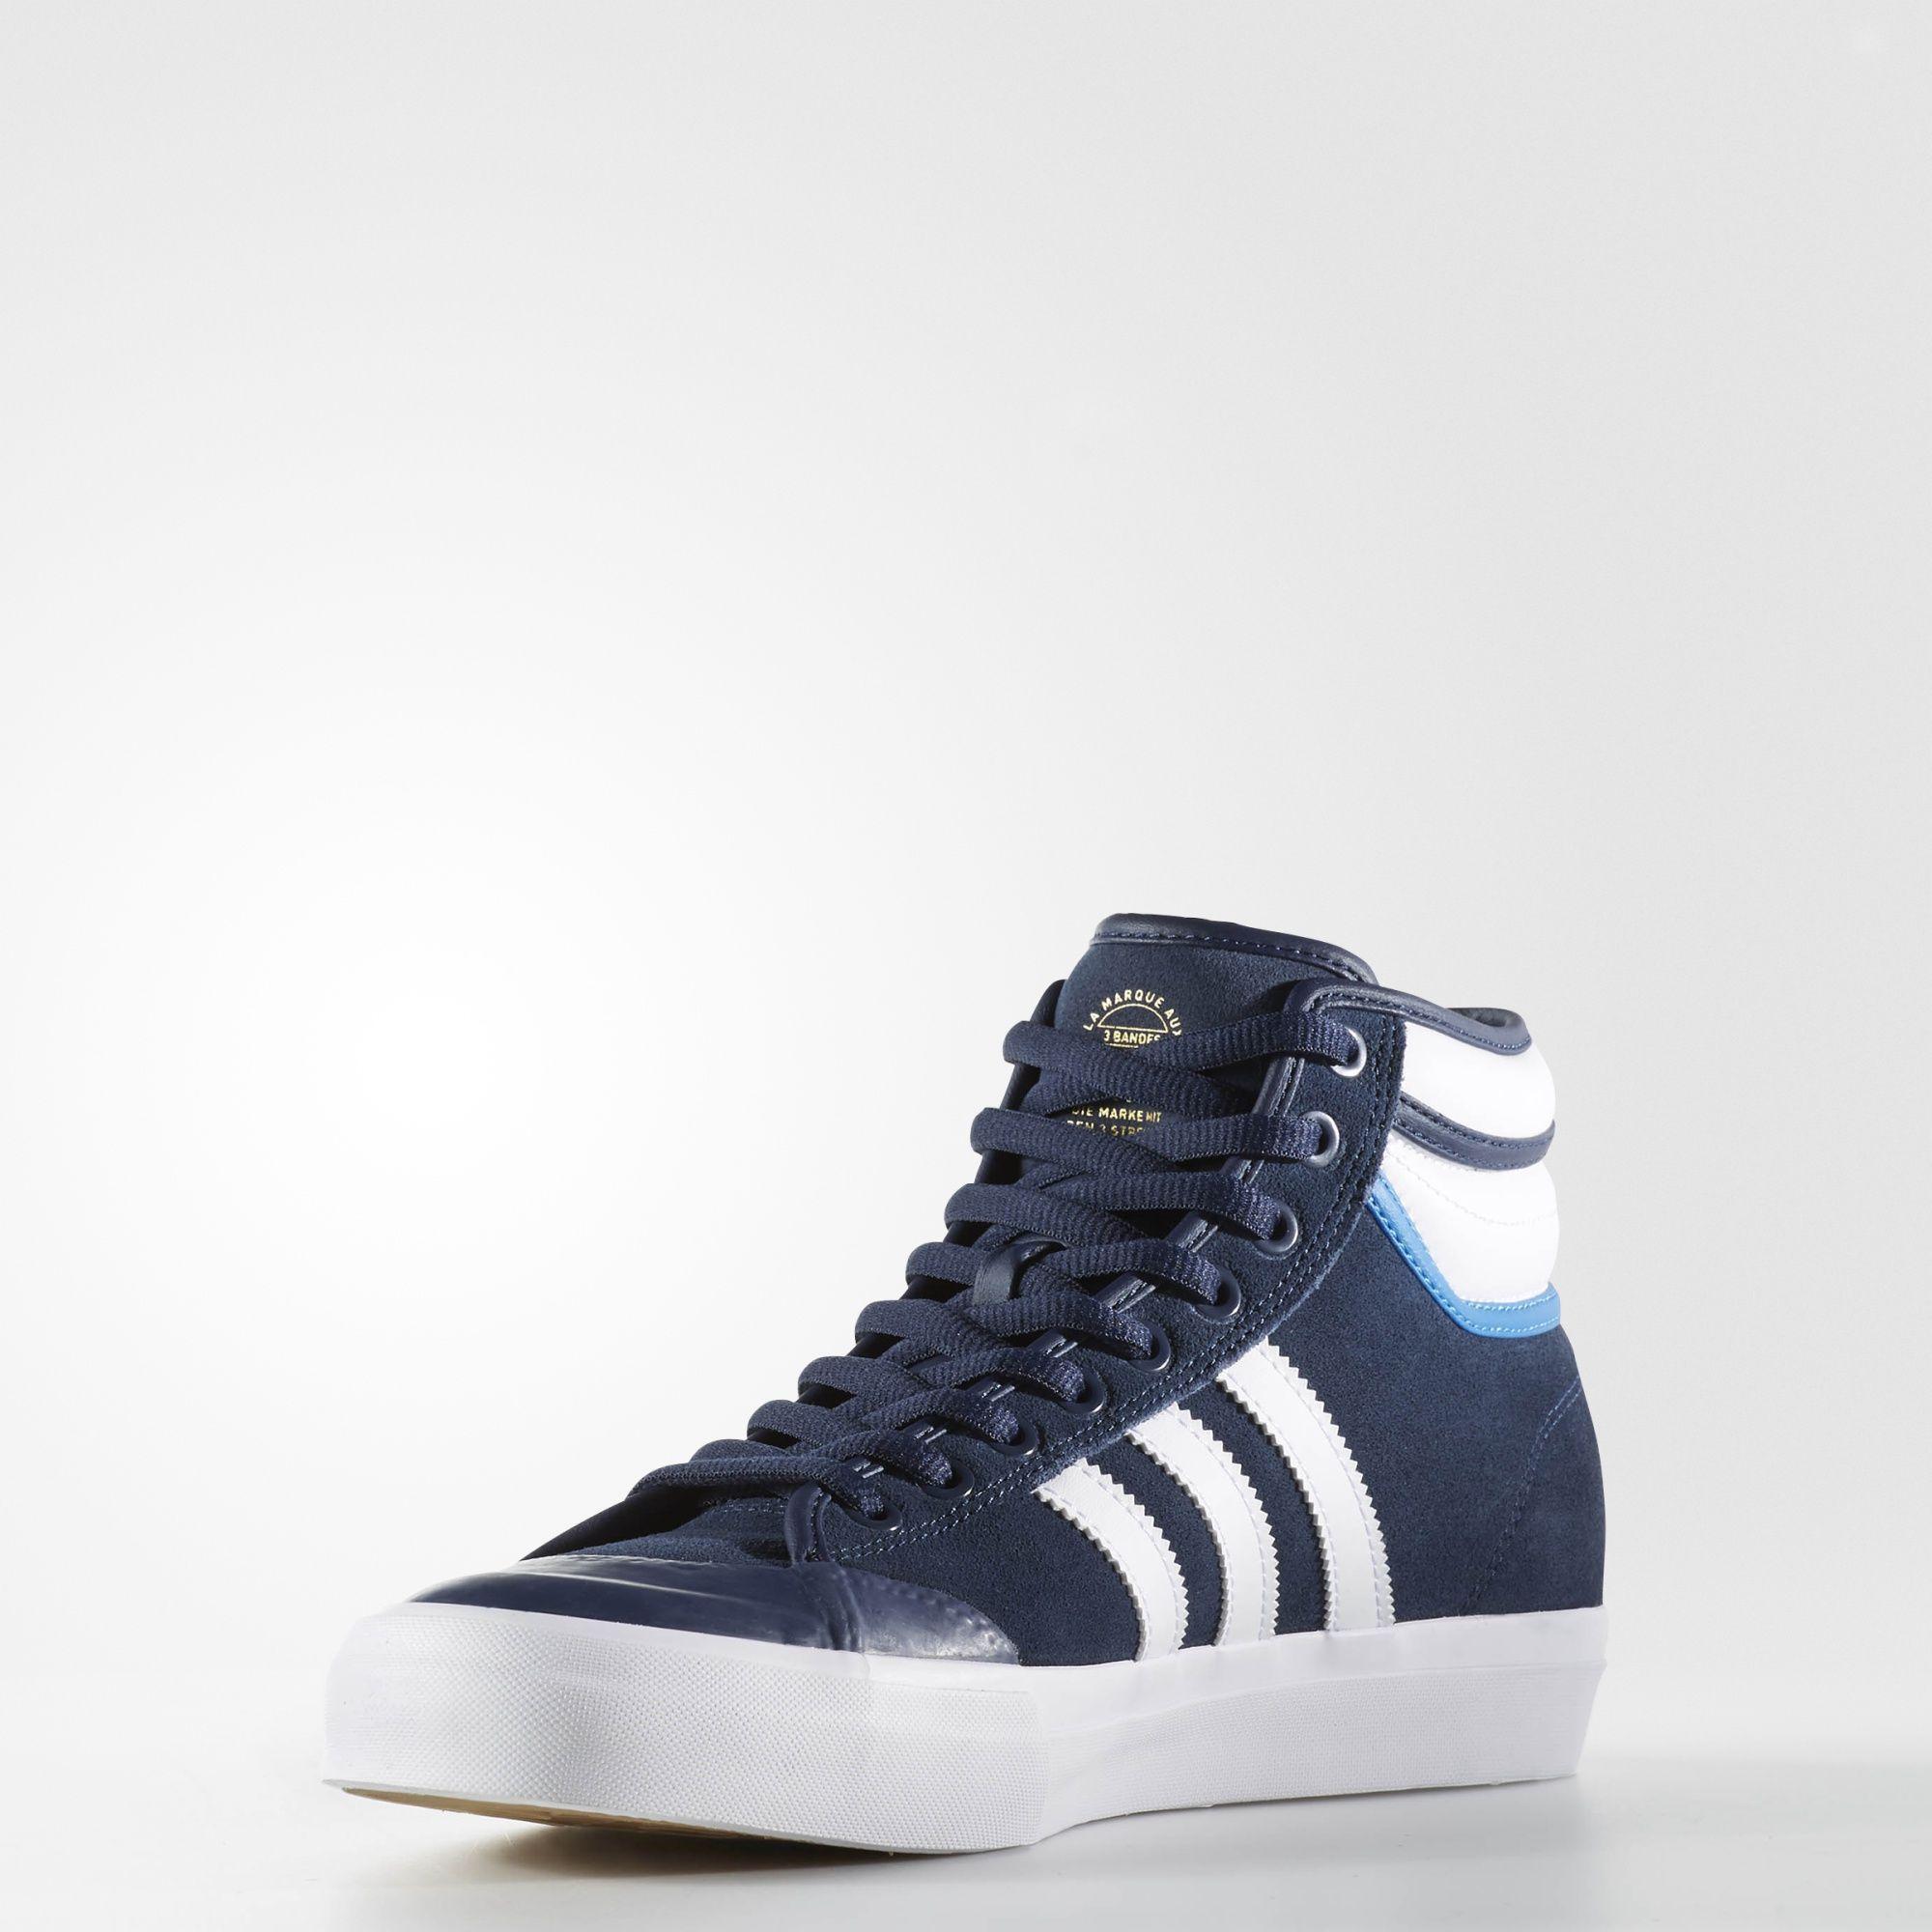 41d53c82de24d4 adidas - Matchcourt High RX2 Shoes